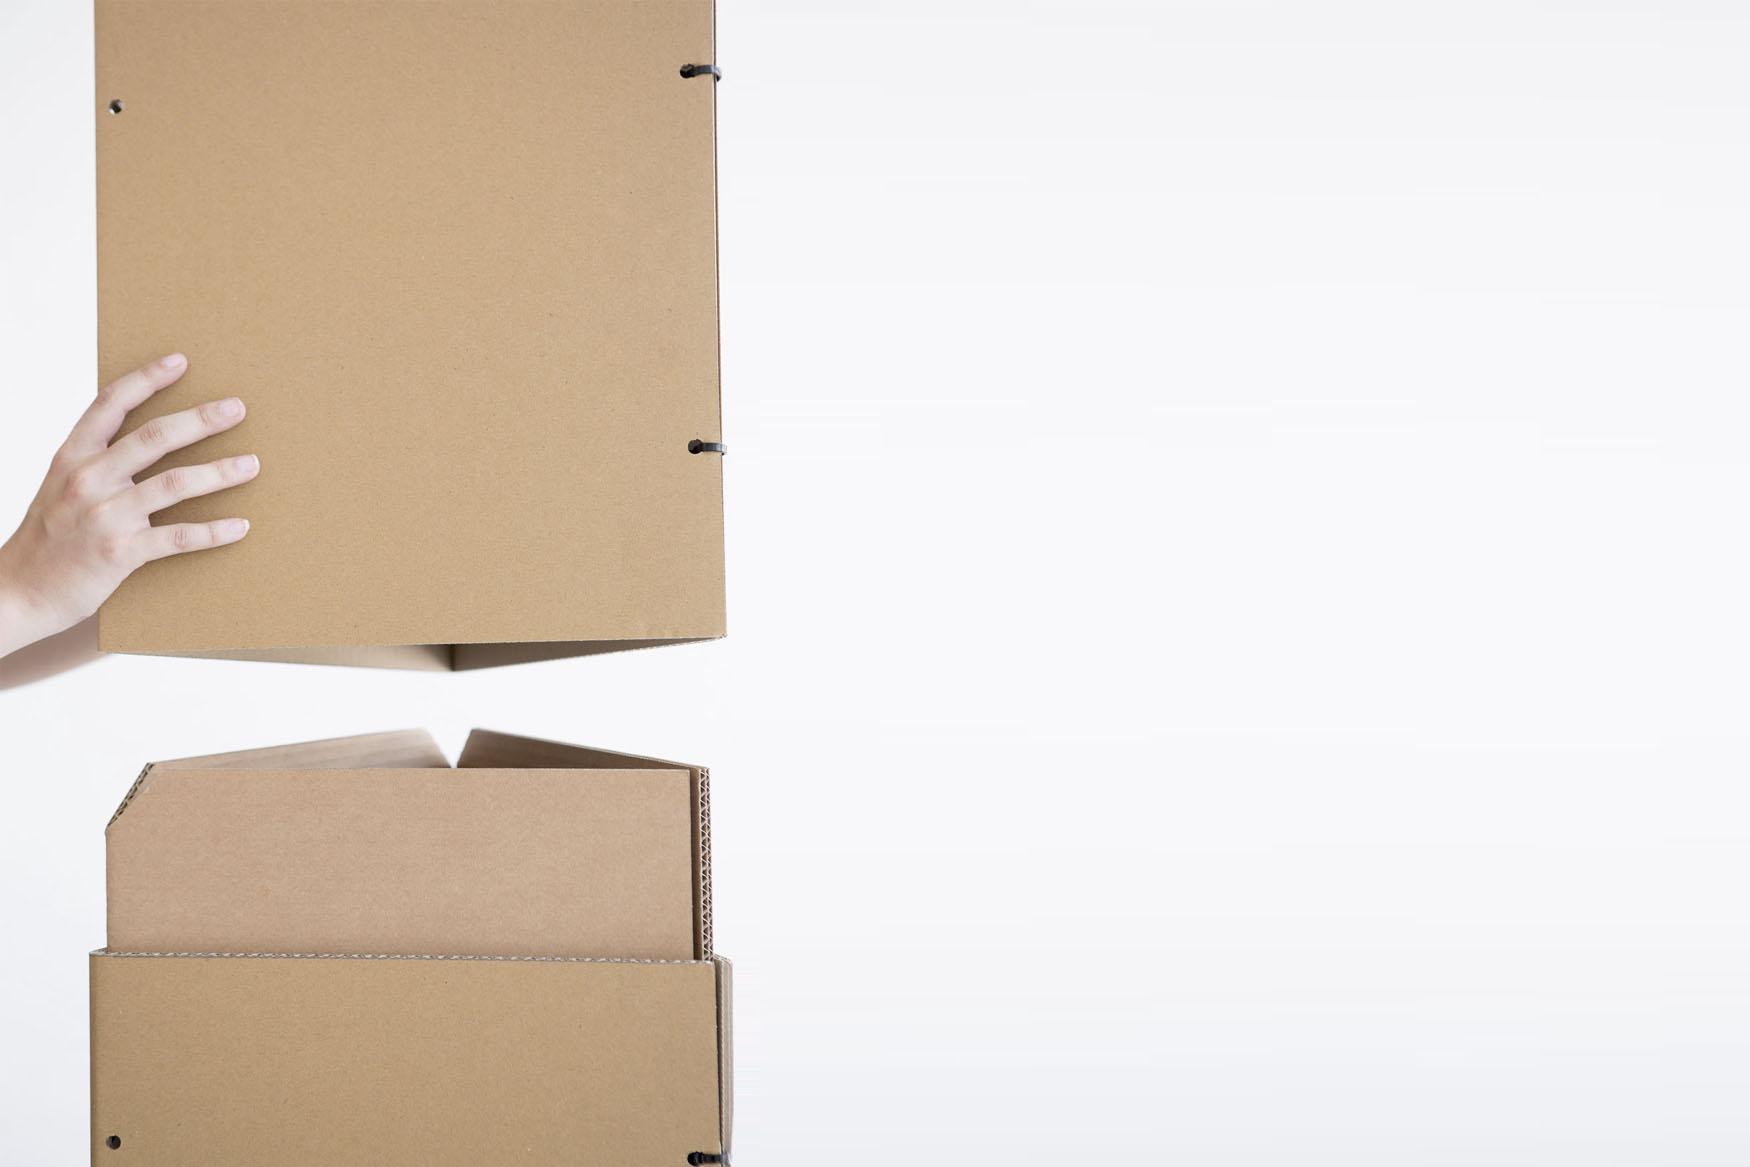 Triplo* cartón sistema montaje exposicion efimaro corner escaparate